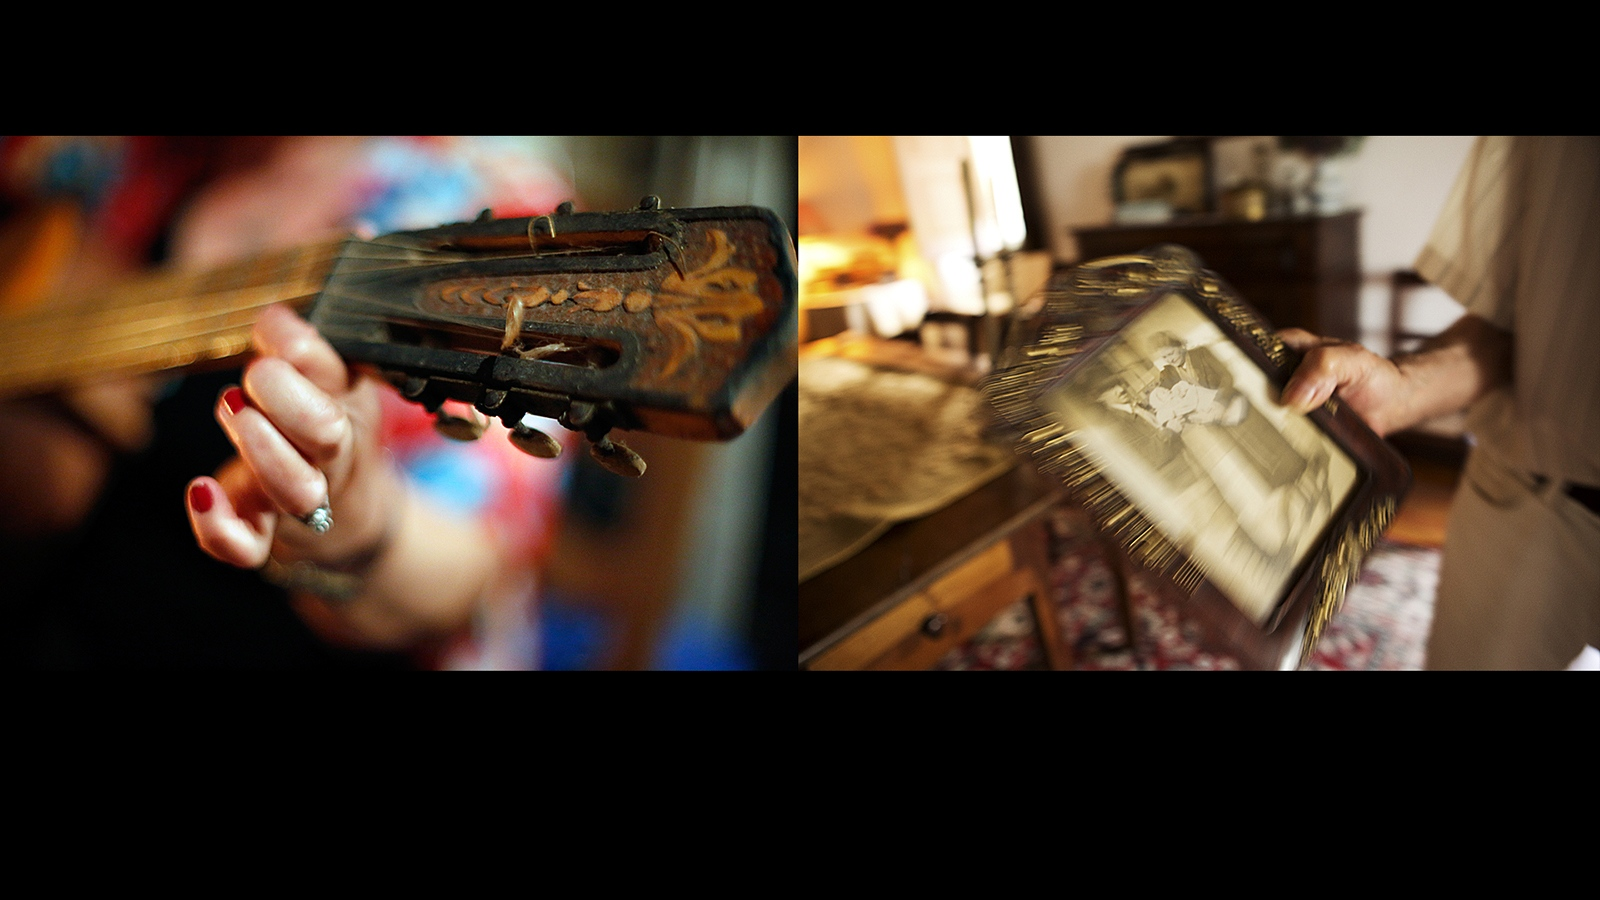 Art and Documentary Photography - Loading __TheresaOrtolani_02.jpg